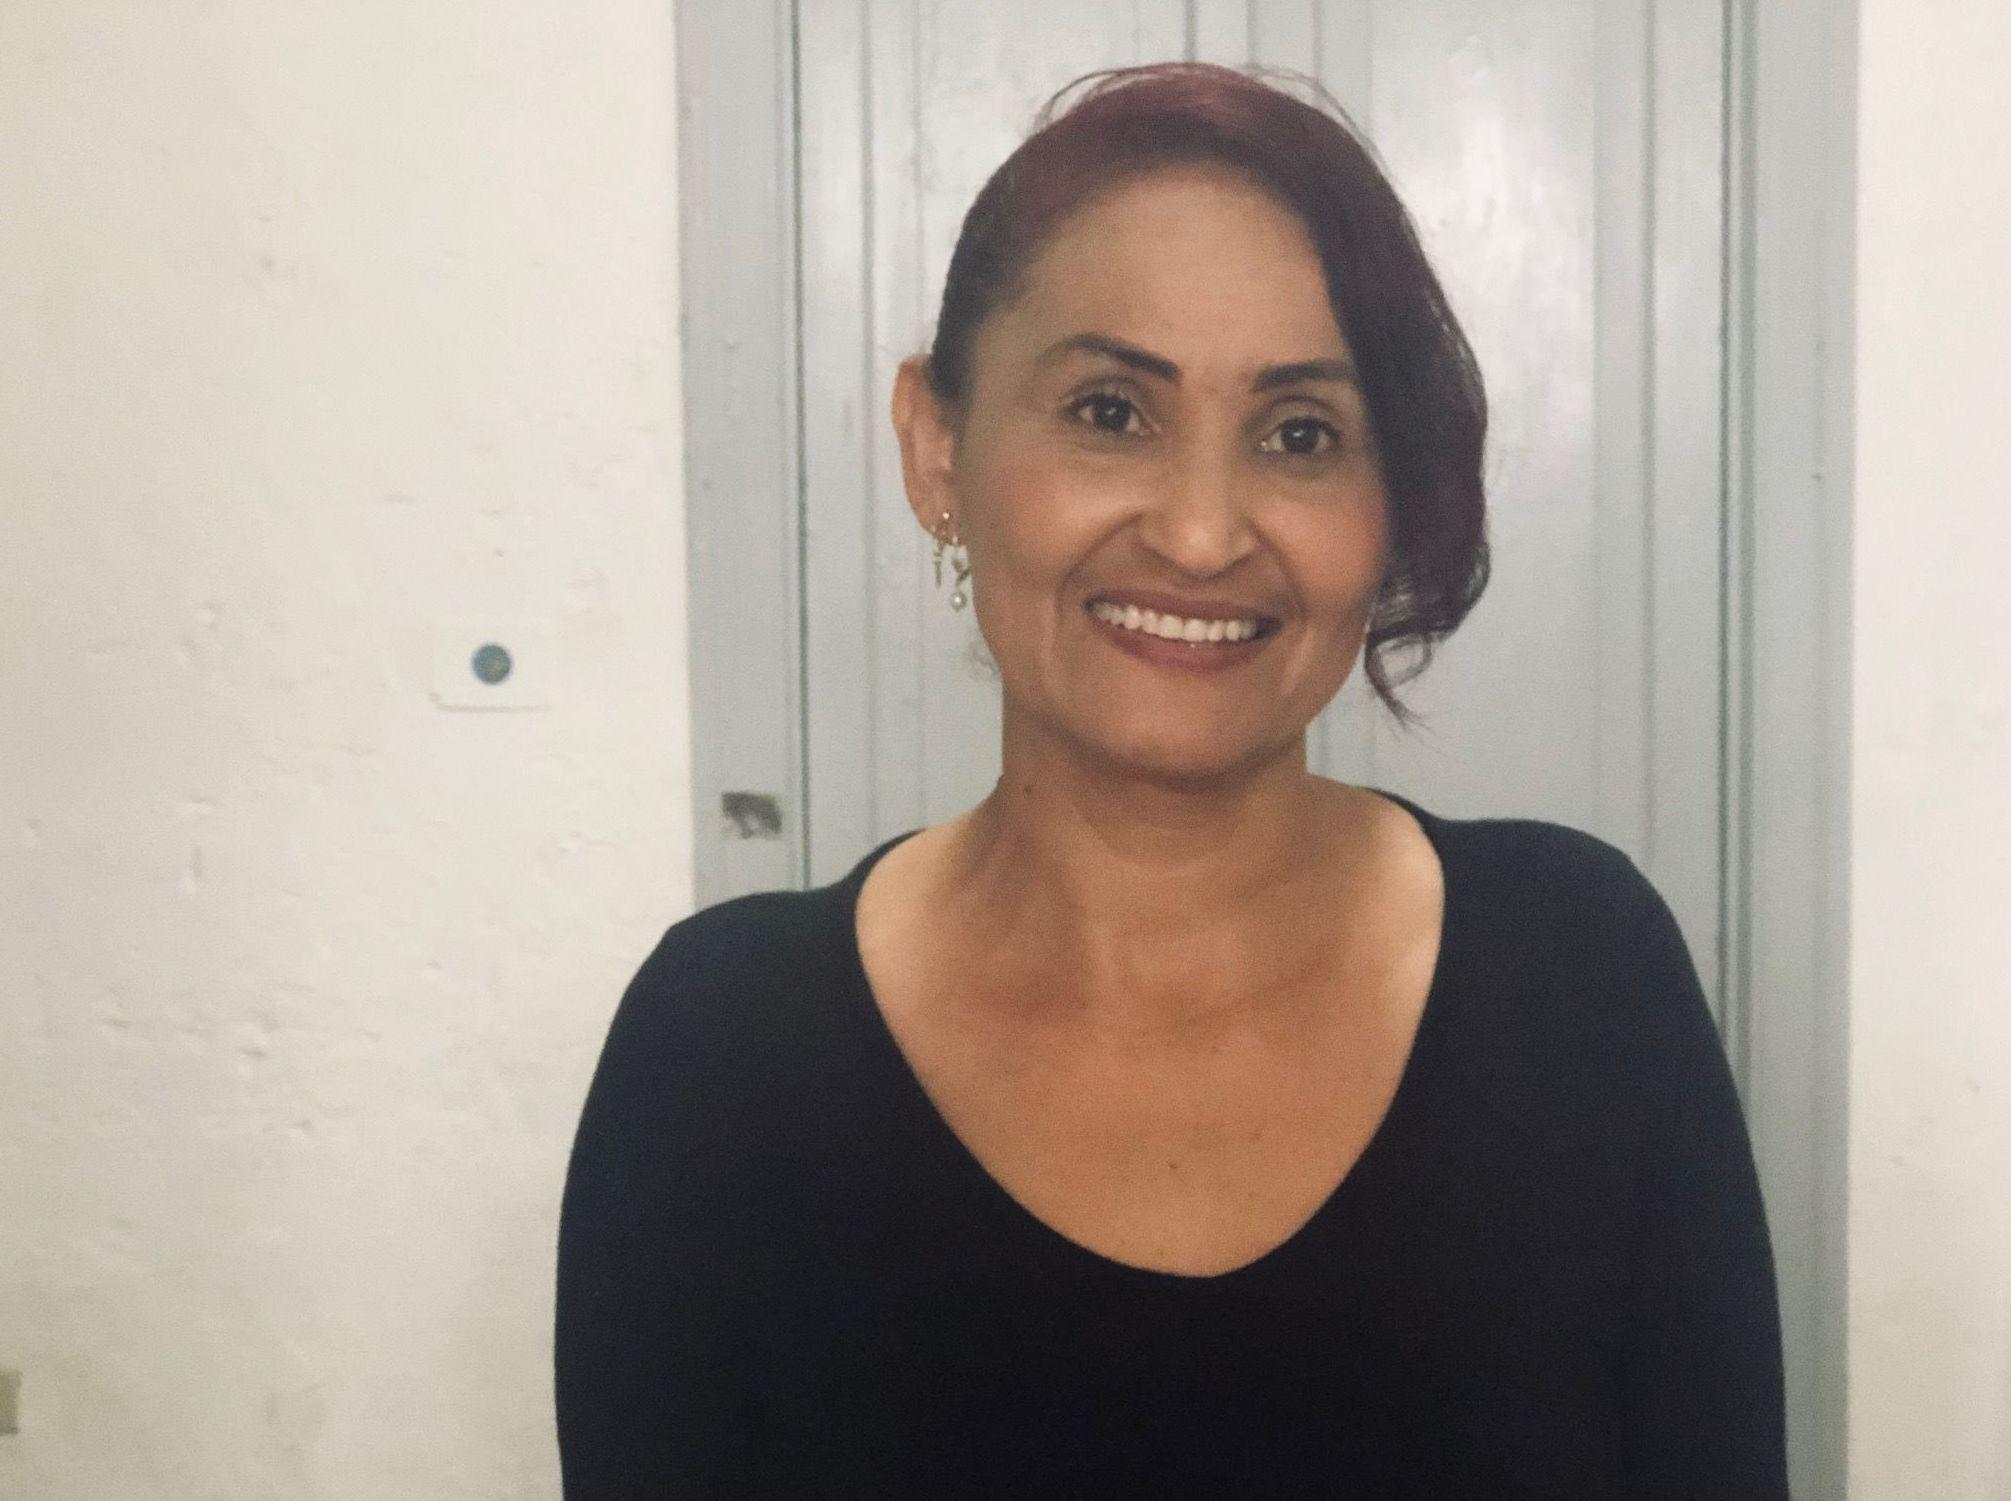 Patricia, exguerillera de las FARC